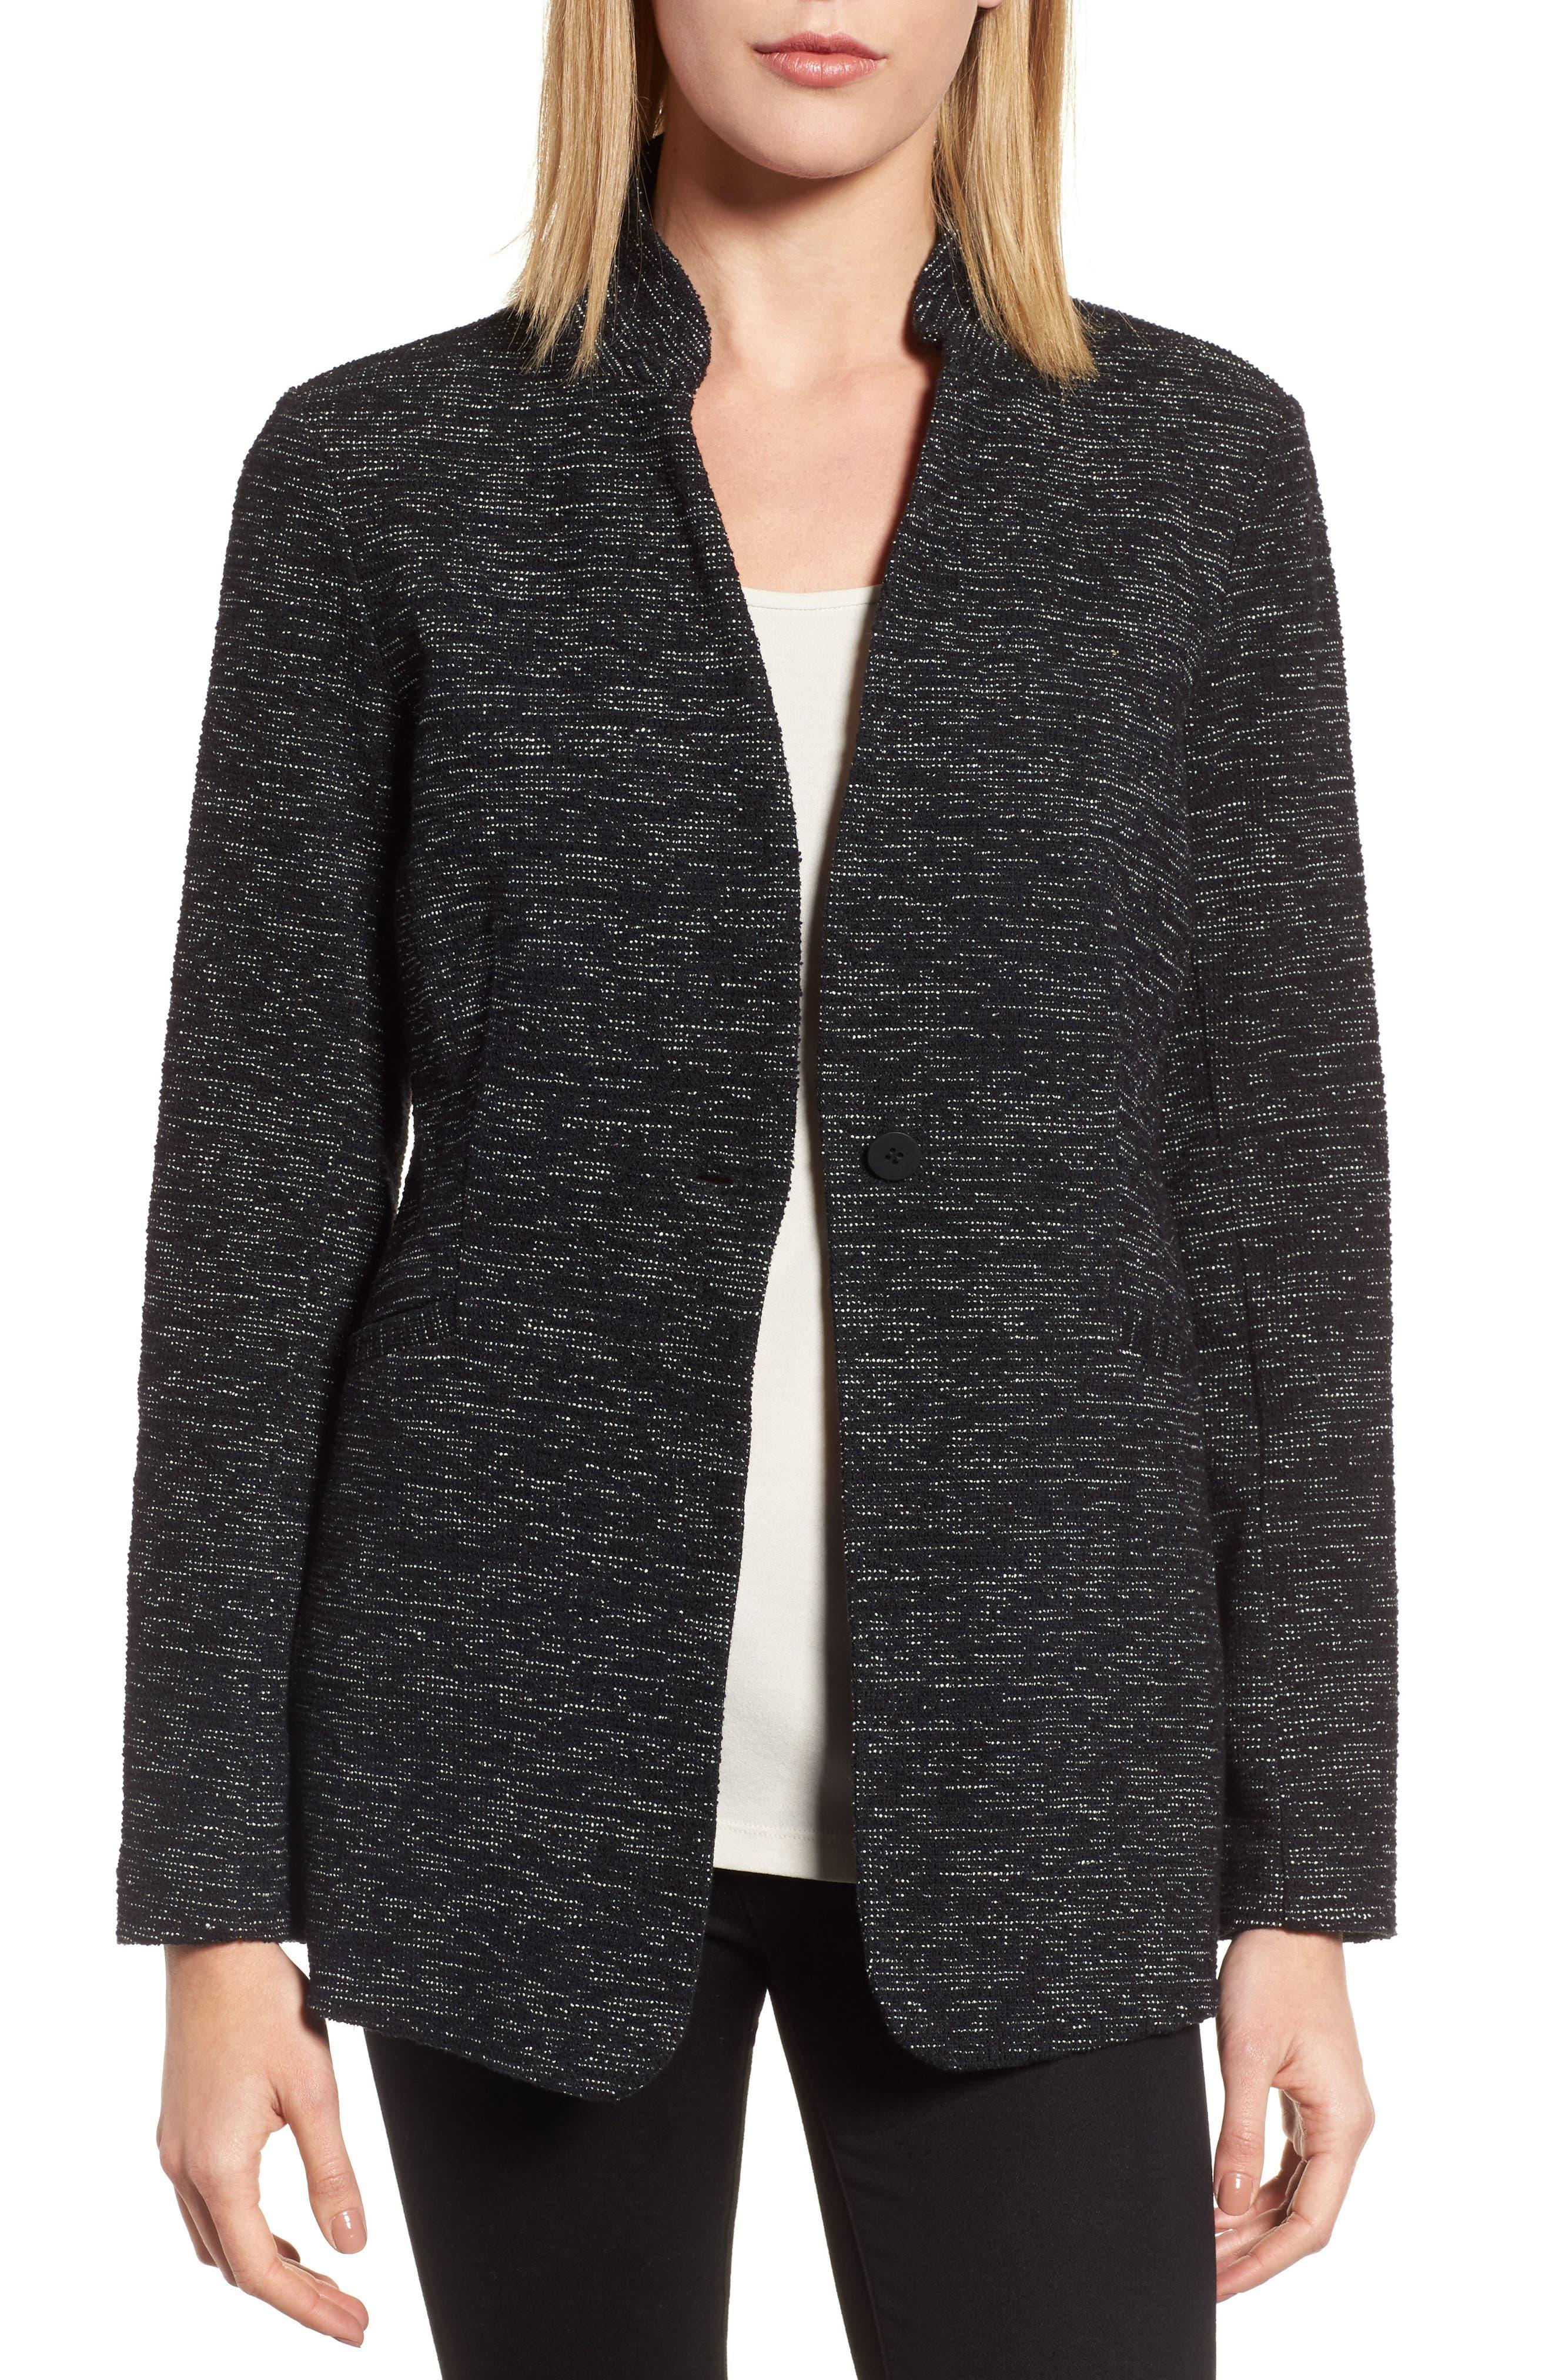 Main Image - Eileen Fisher Organic Cotton Blend Tweed Jacket